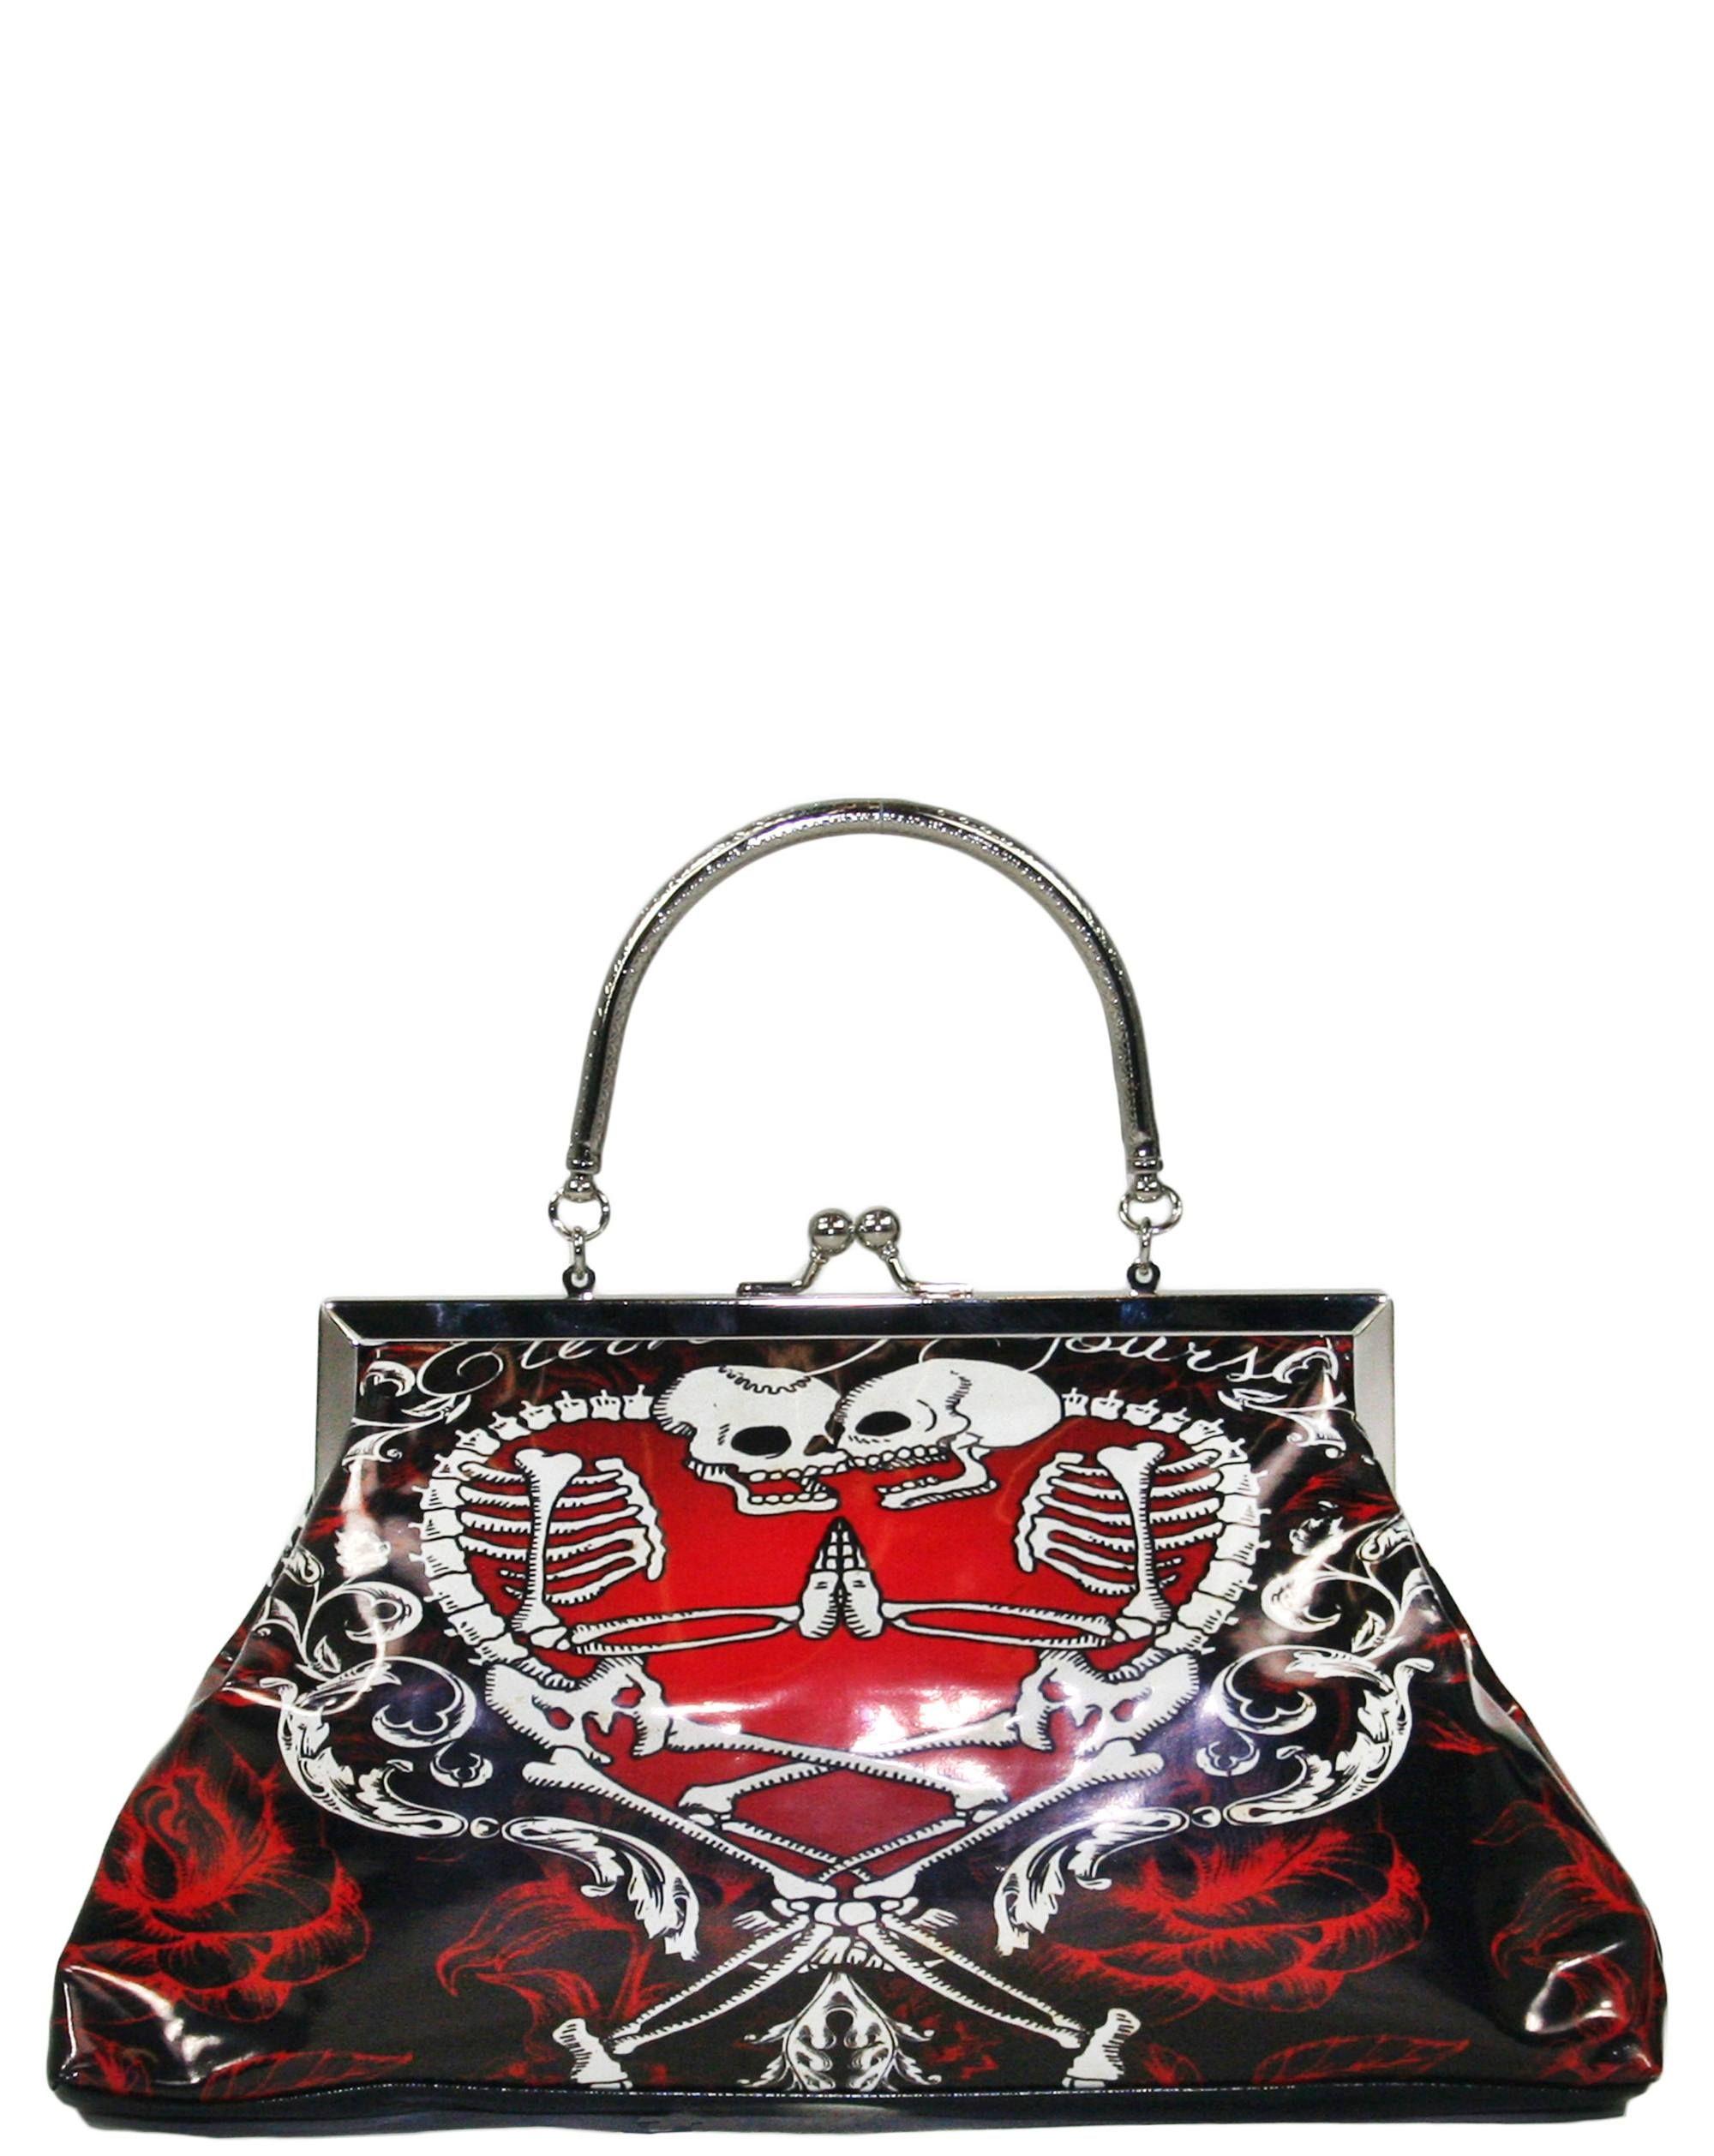 Banshee bag eternal bags best purses fun bags